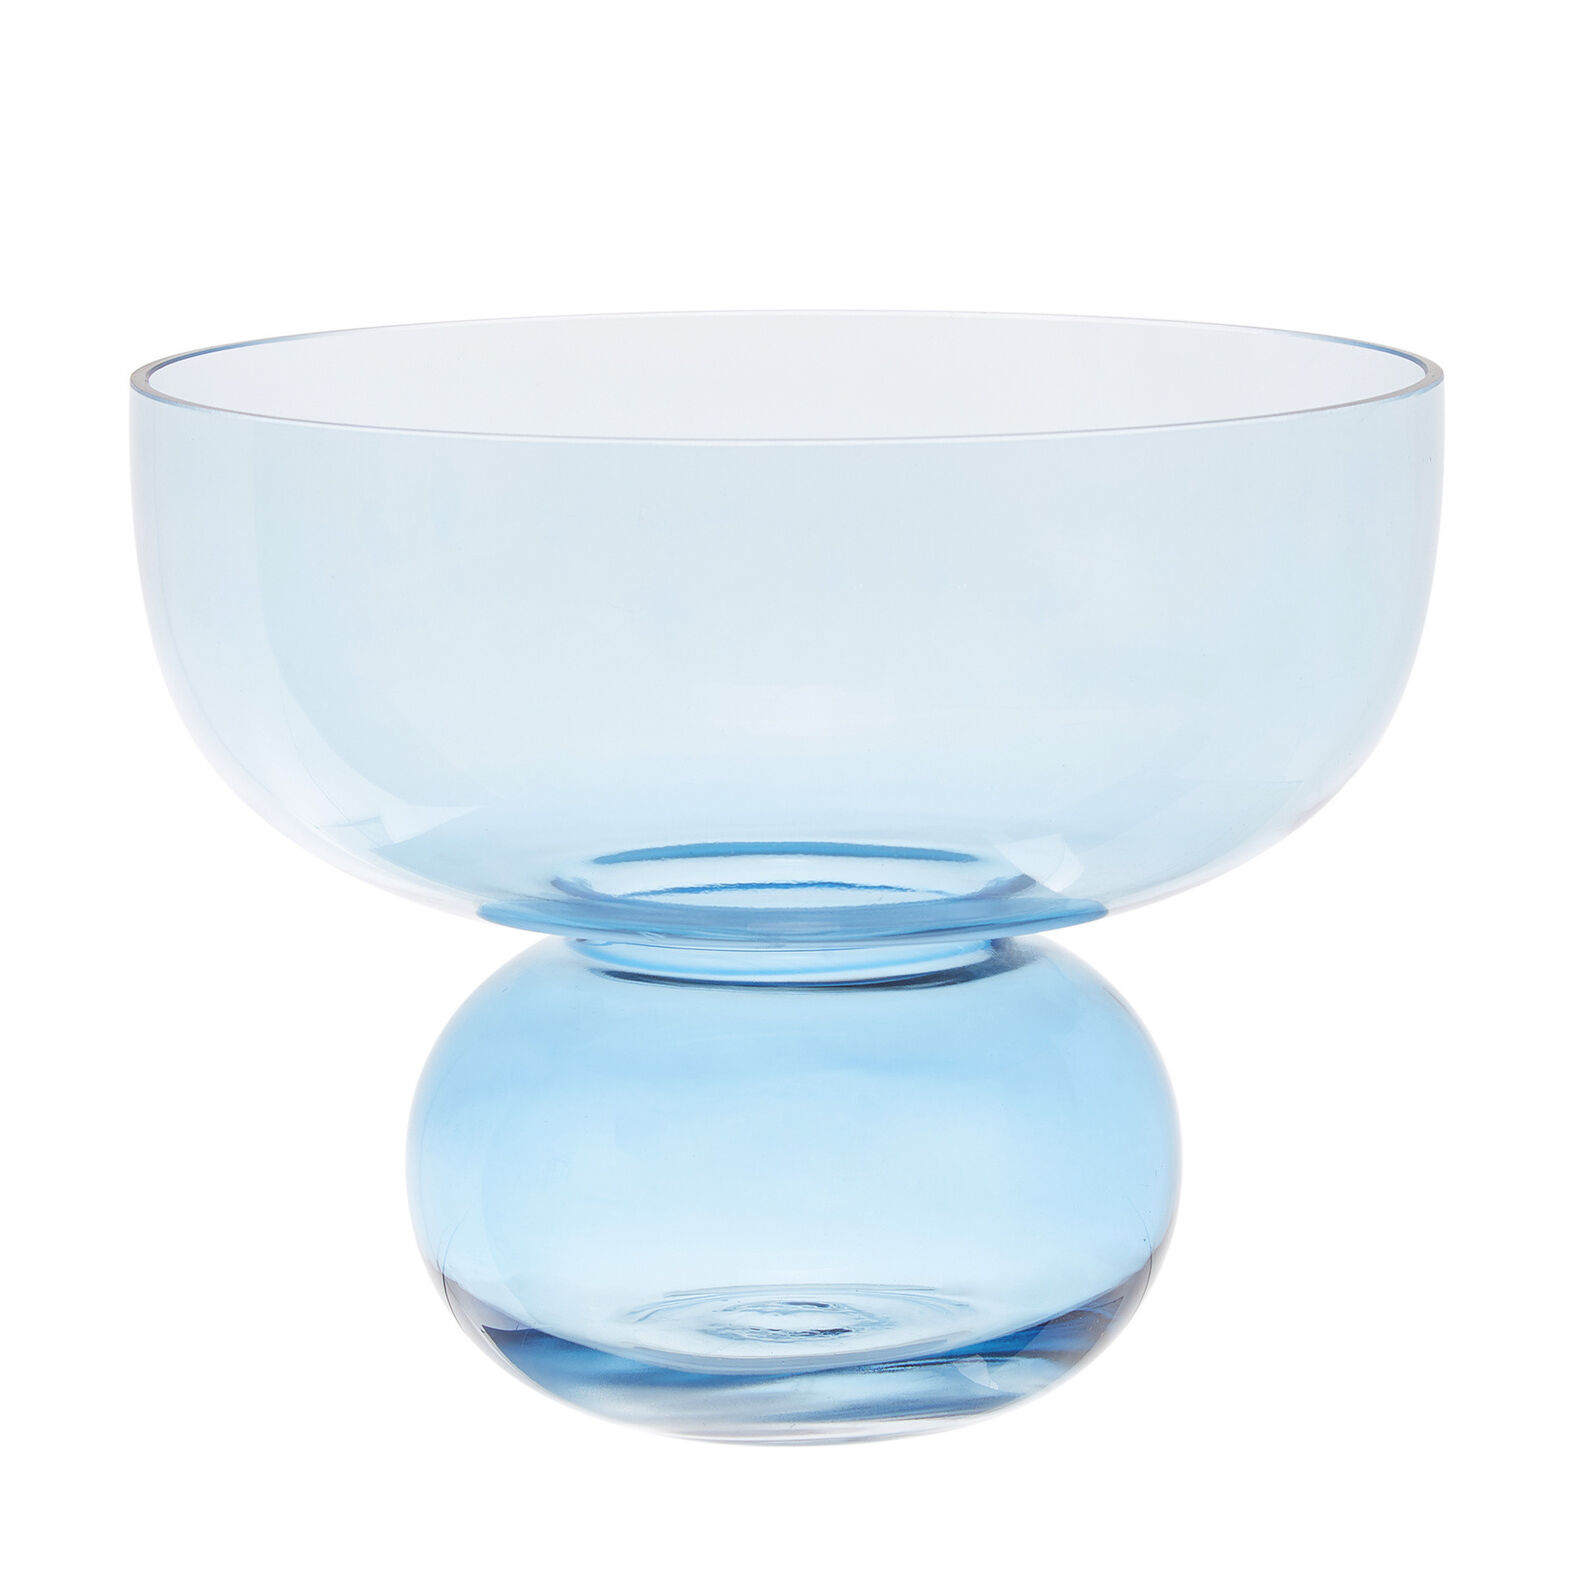 Hand-finished glass vase